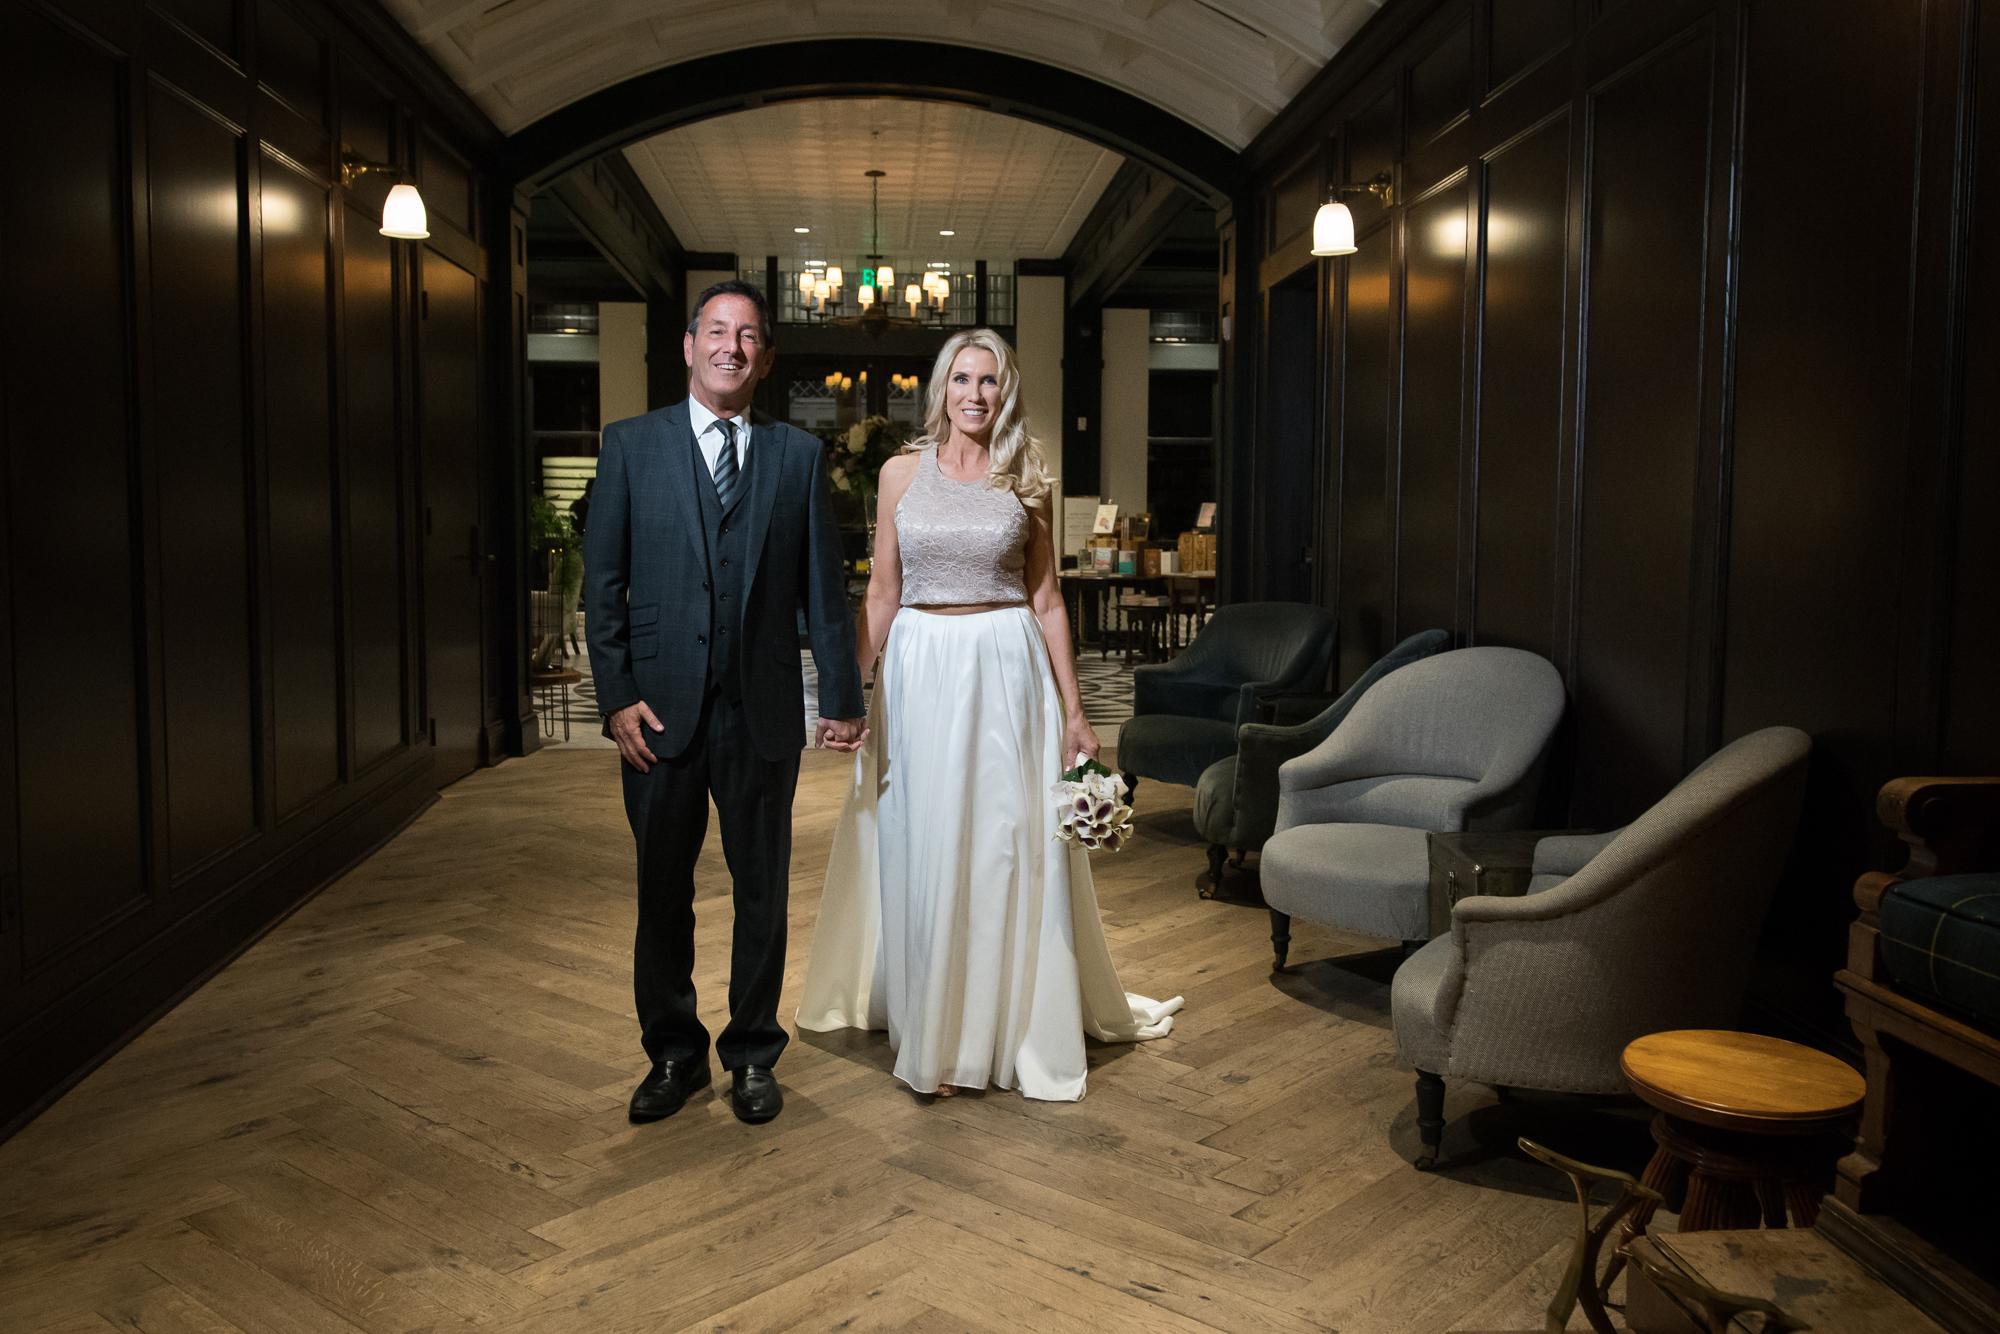 Oxford-Exchange-wedding-photo, bride-and-groom